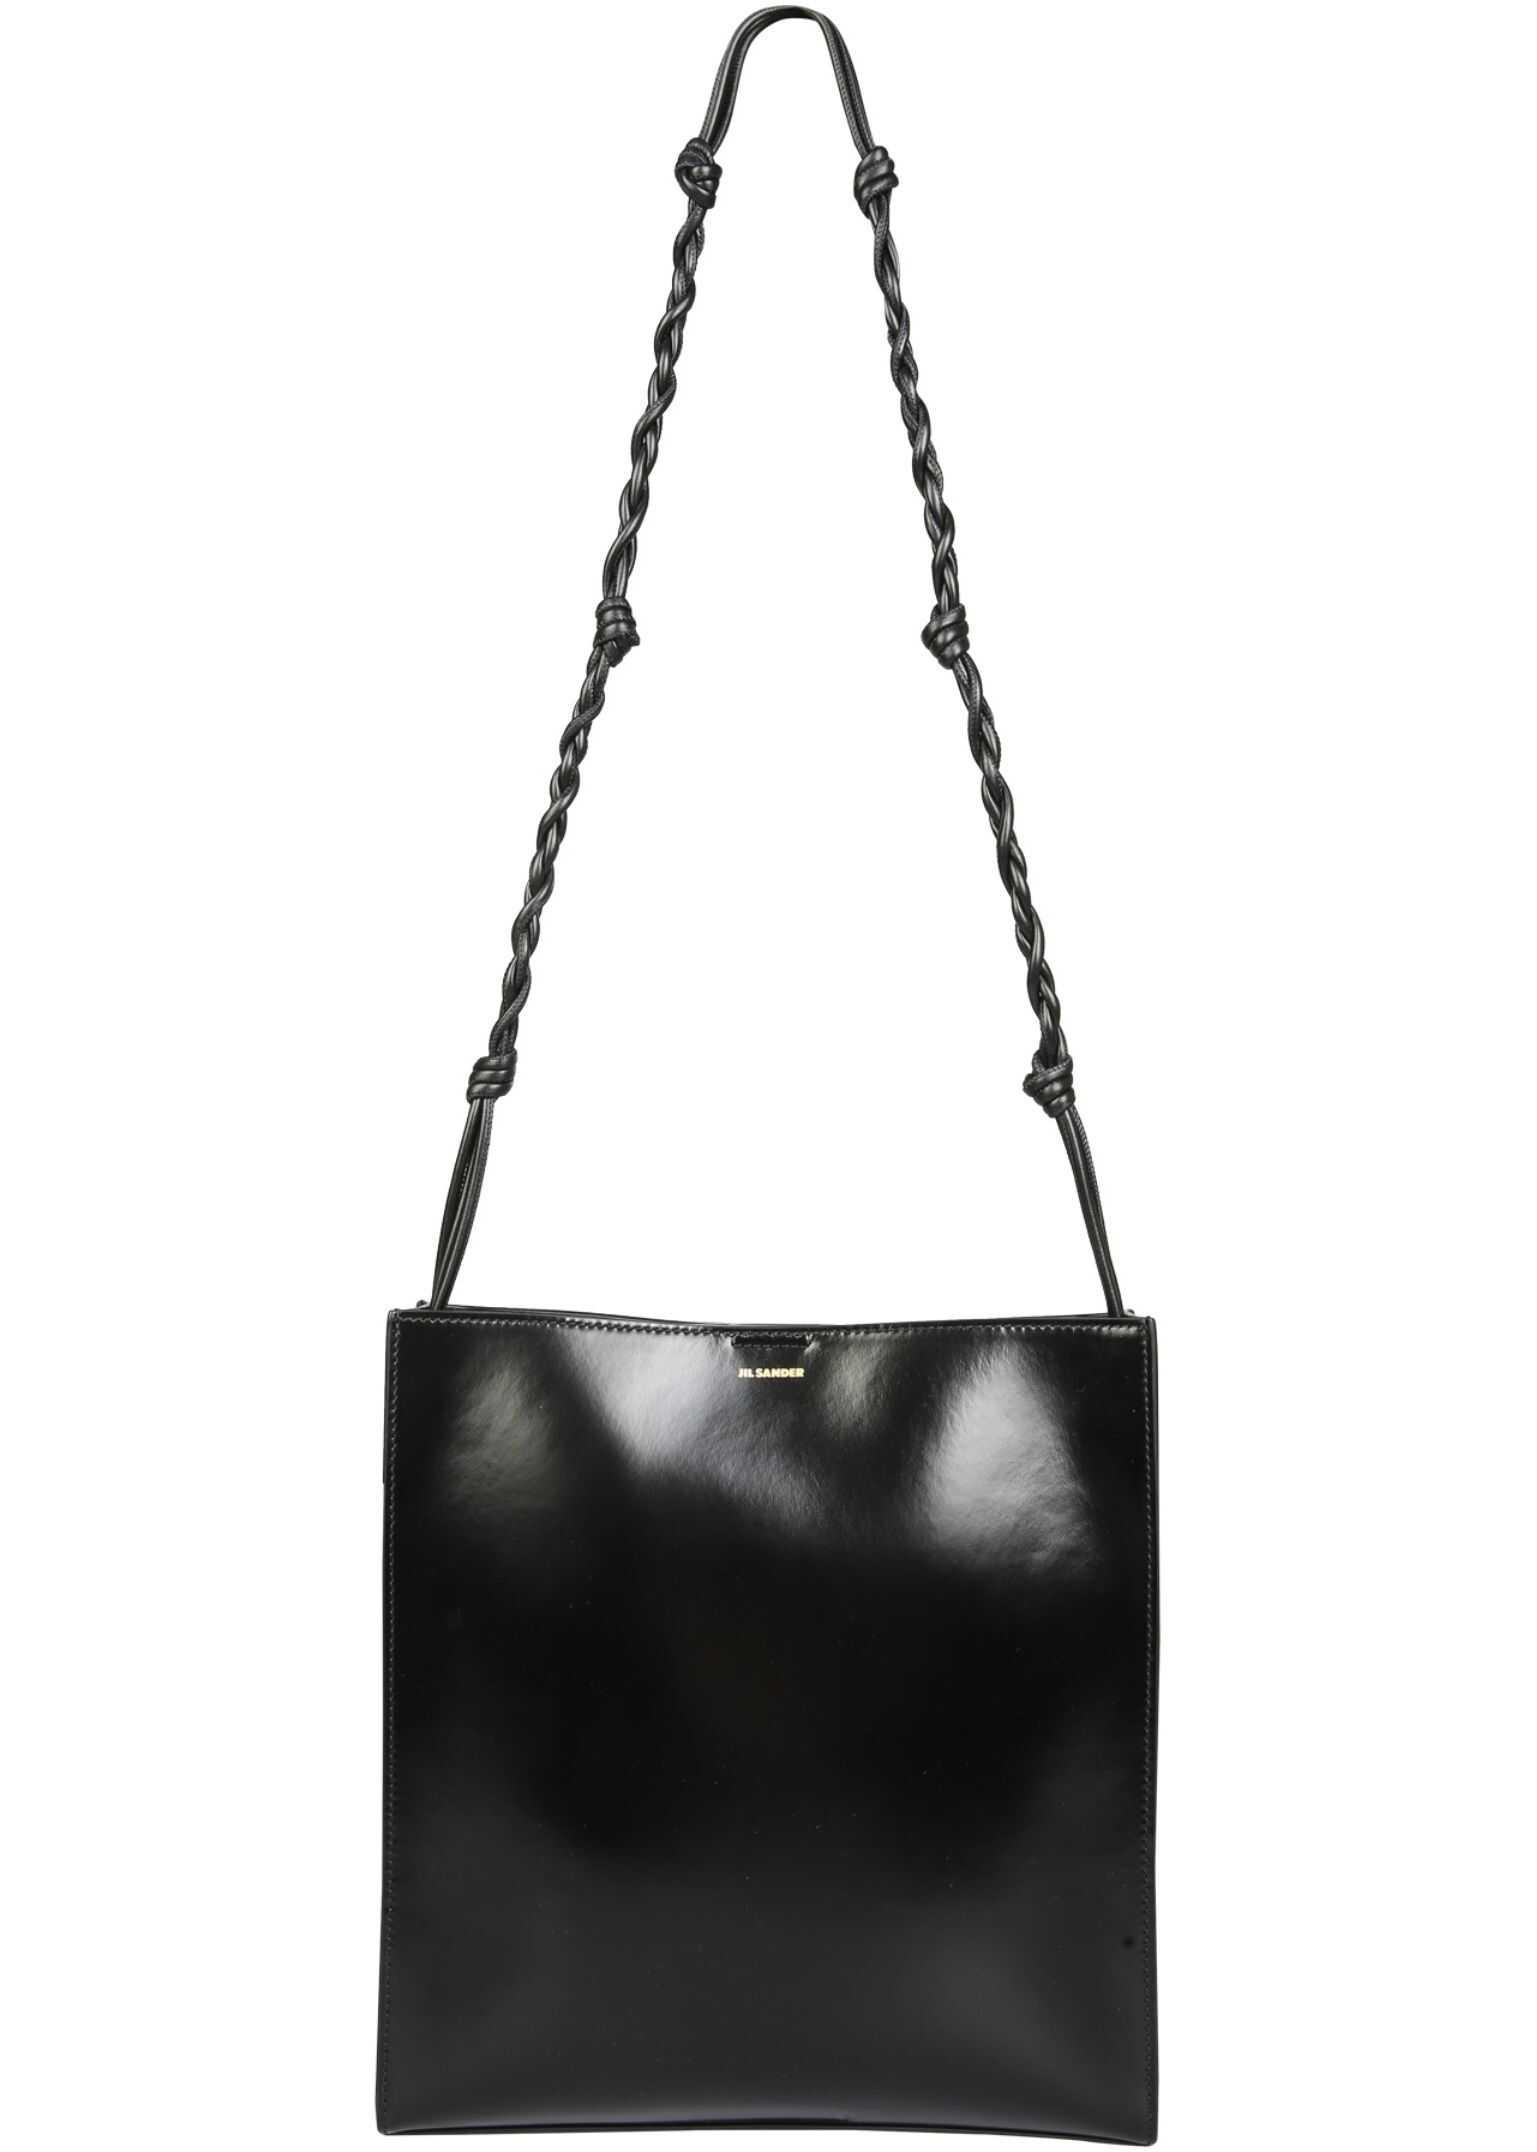 Jil Sander Medium Tangle Bag JSPS853172_WSB69148N001 BLACK imagine b-mall.ro